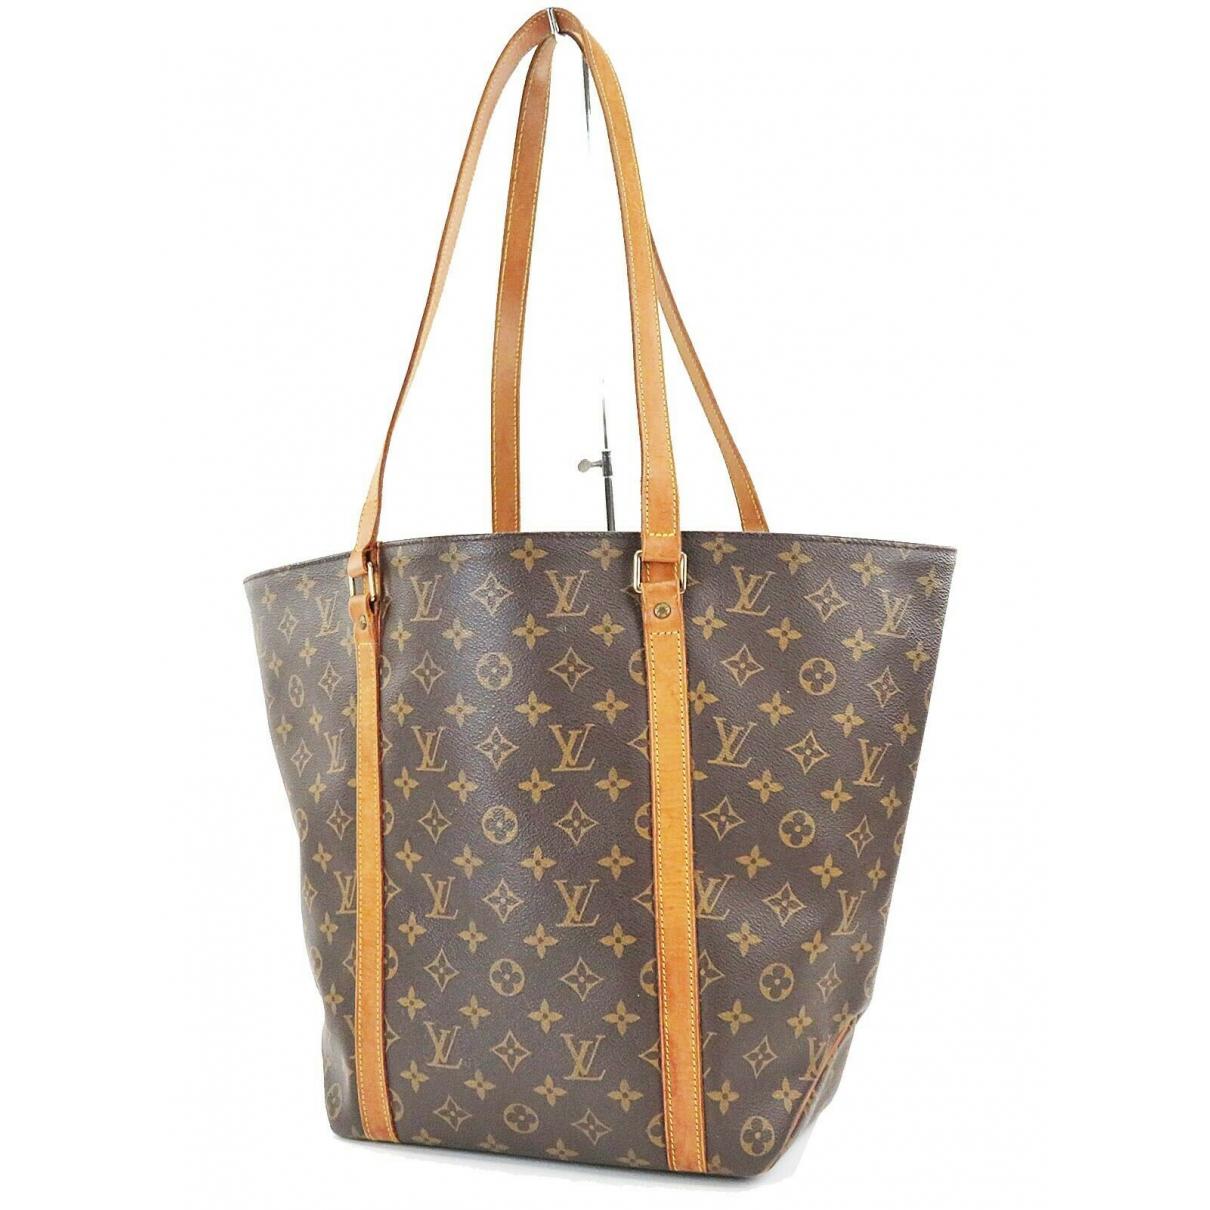 Louis Vuitton Shopping Handtasche in  Braun Leder